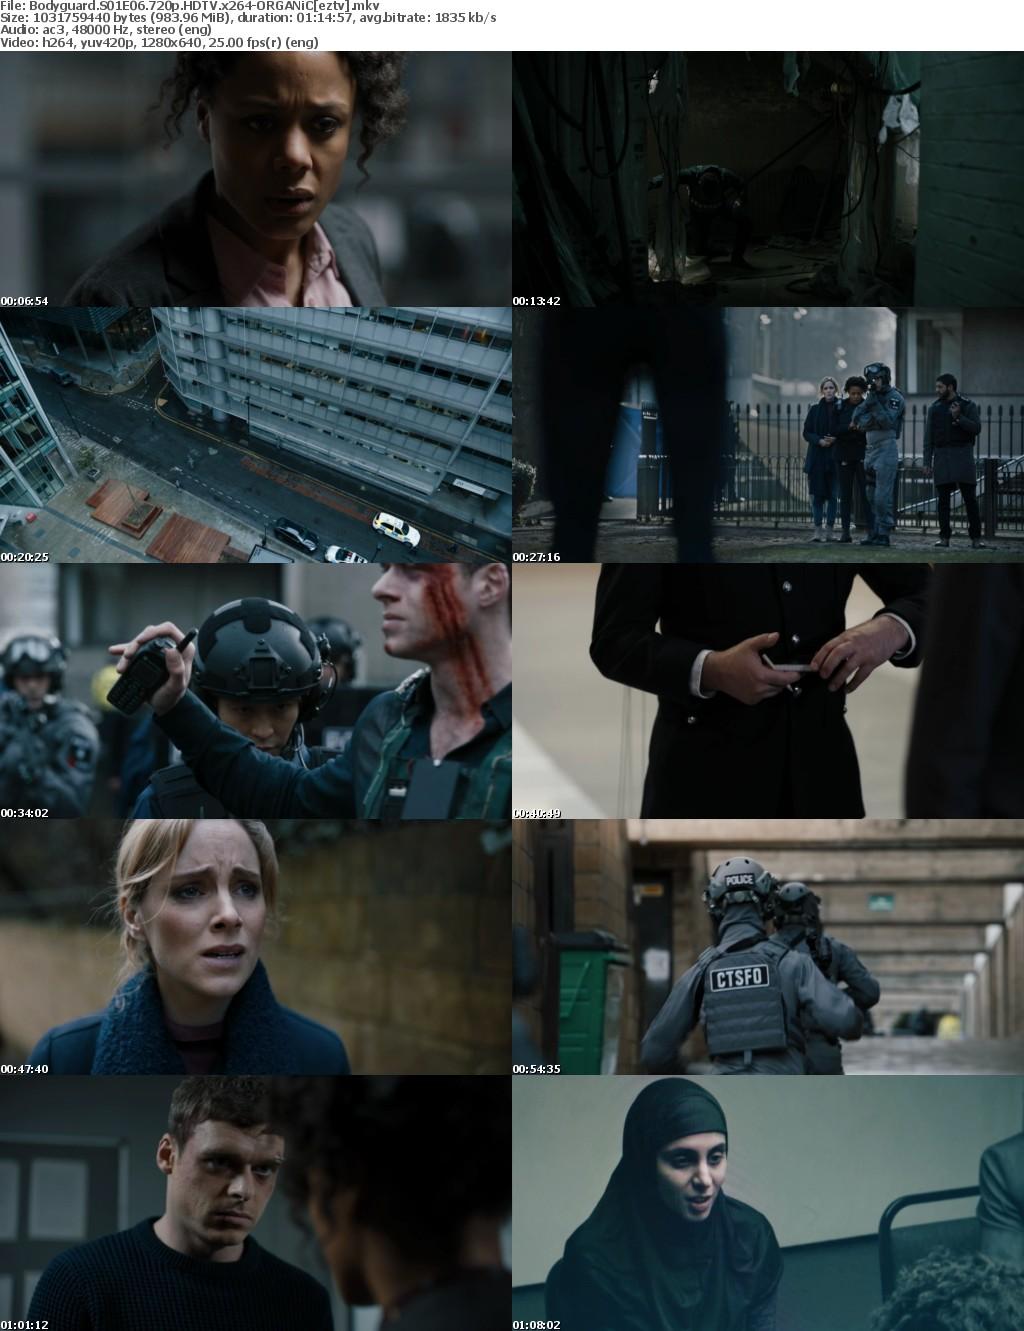 Bodyguard S01E06 720p HDTV x264-ORGANiC